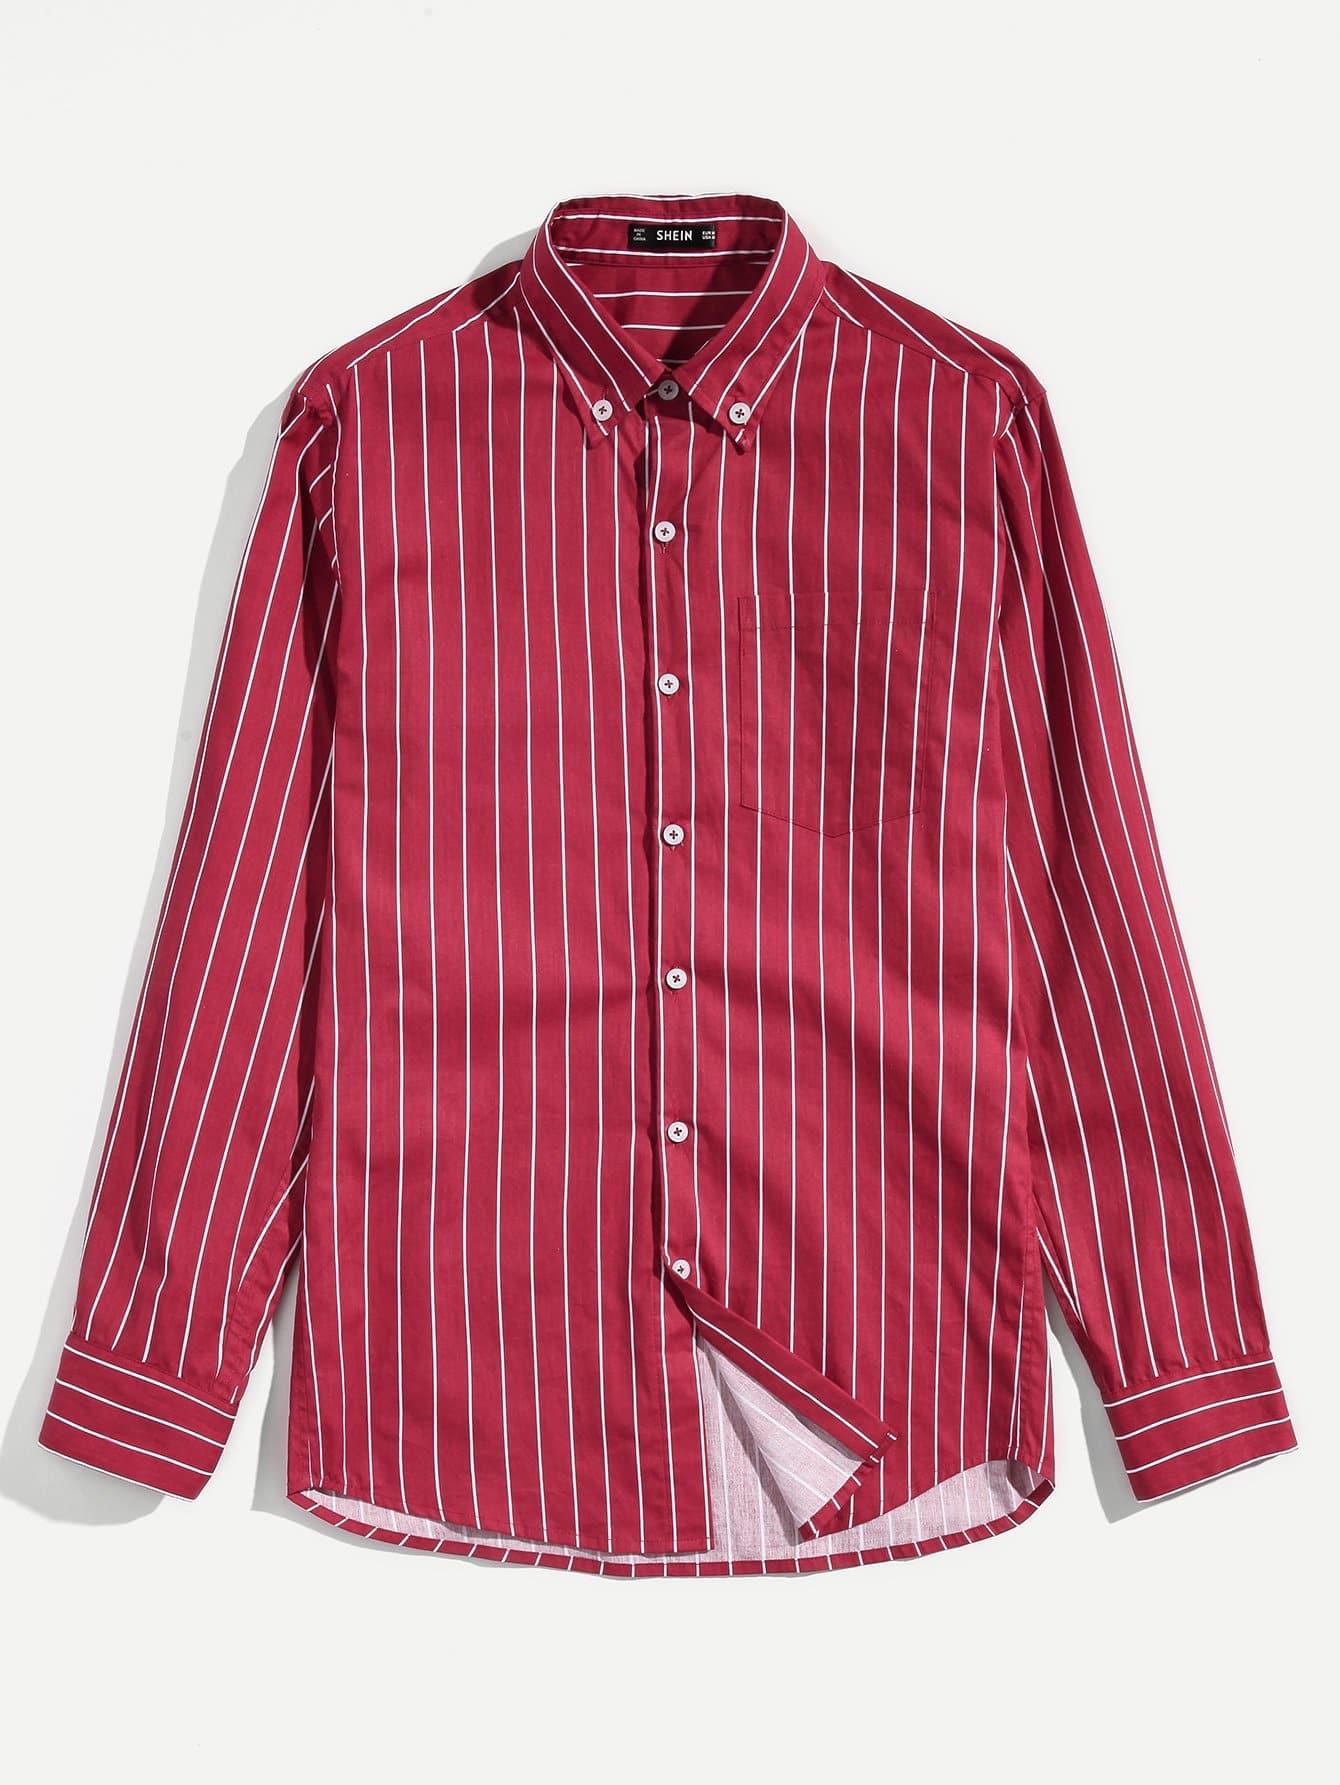 Купить Мужская полосатая карманная ручная рубашка, null, SheIn